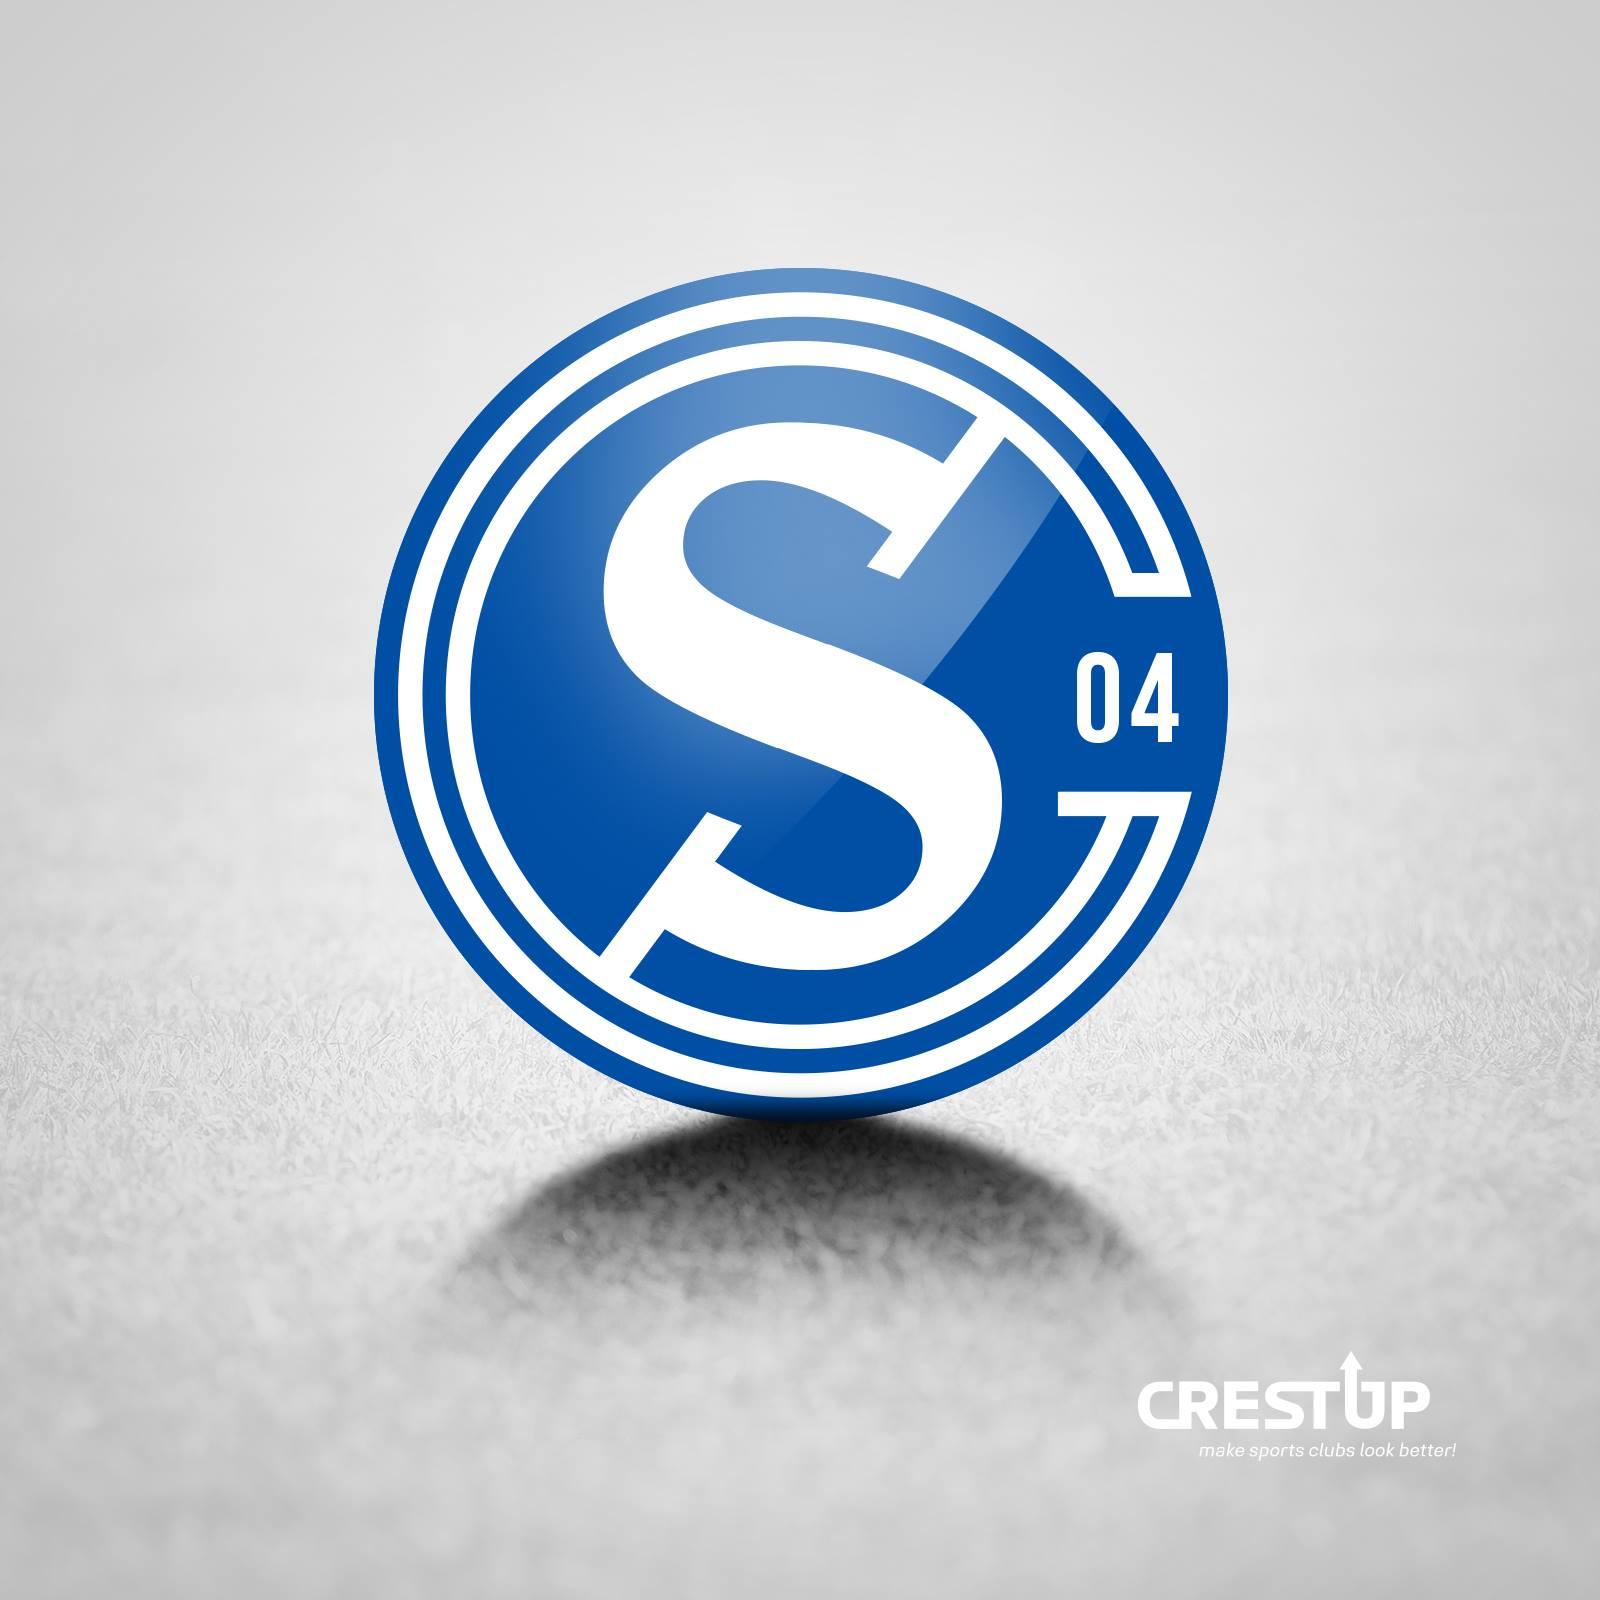 Das Neue Schalke 04 Der Tedesco Code Halbfeldflanke